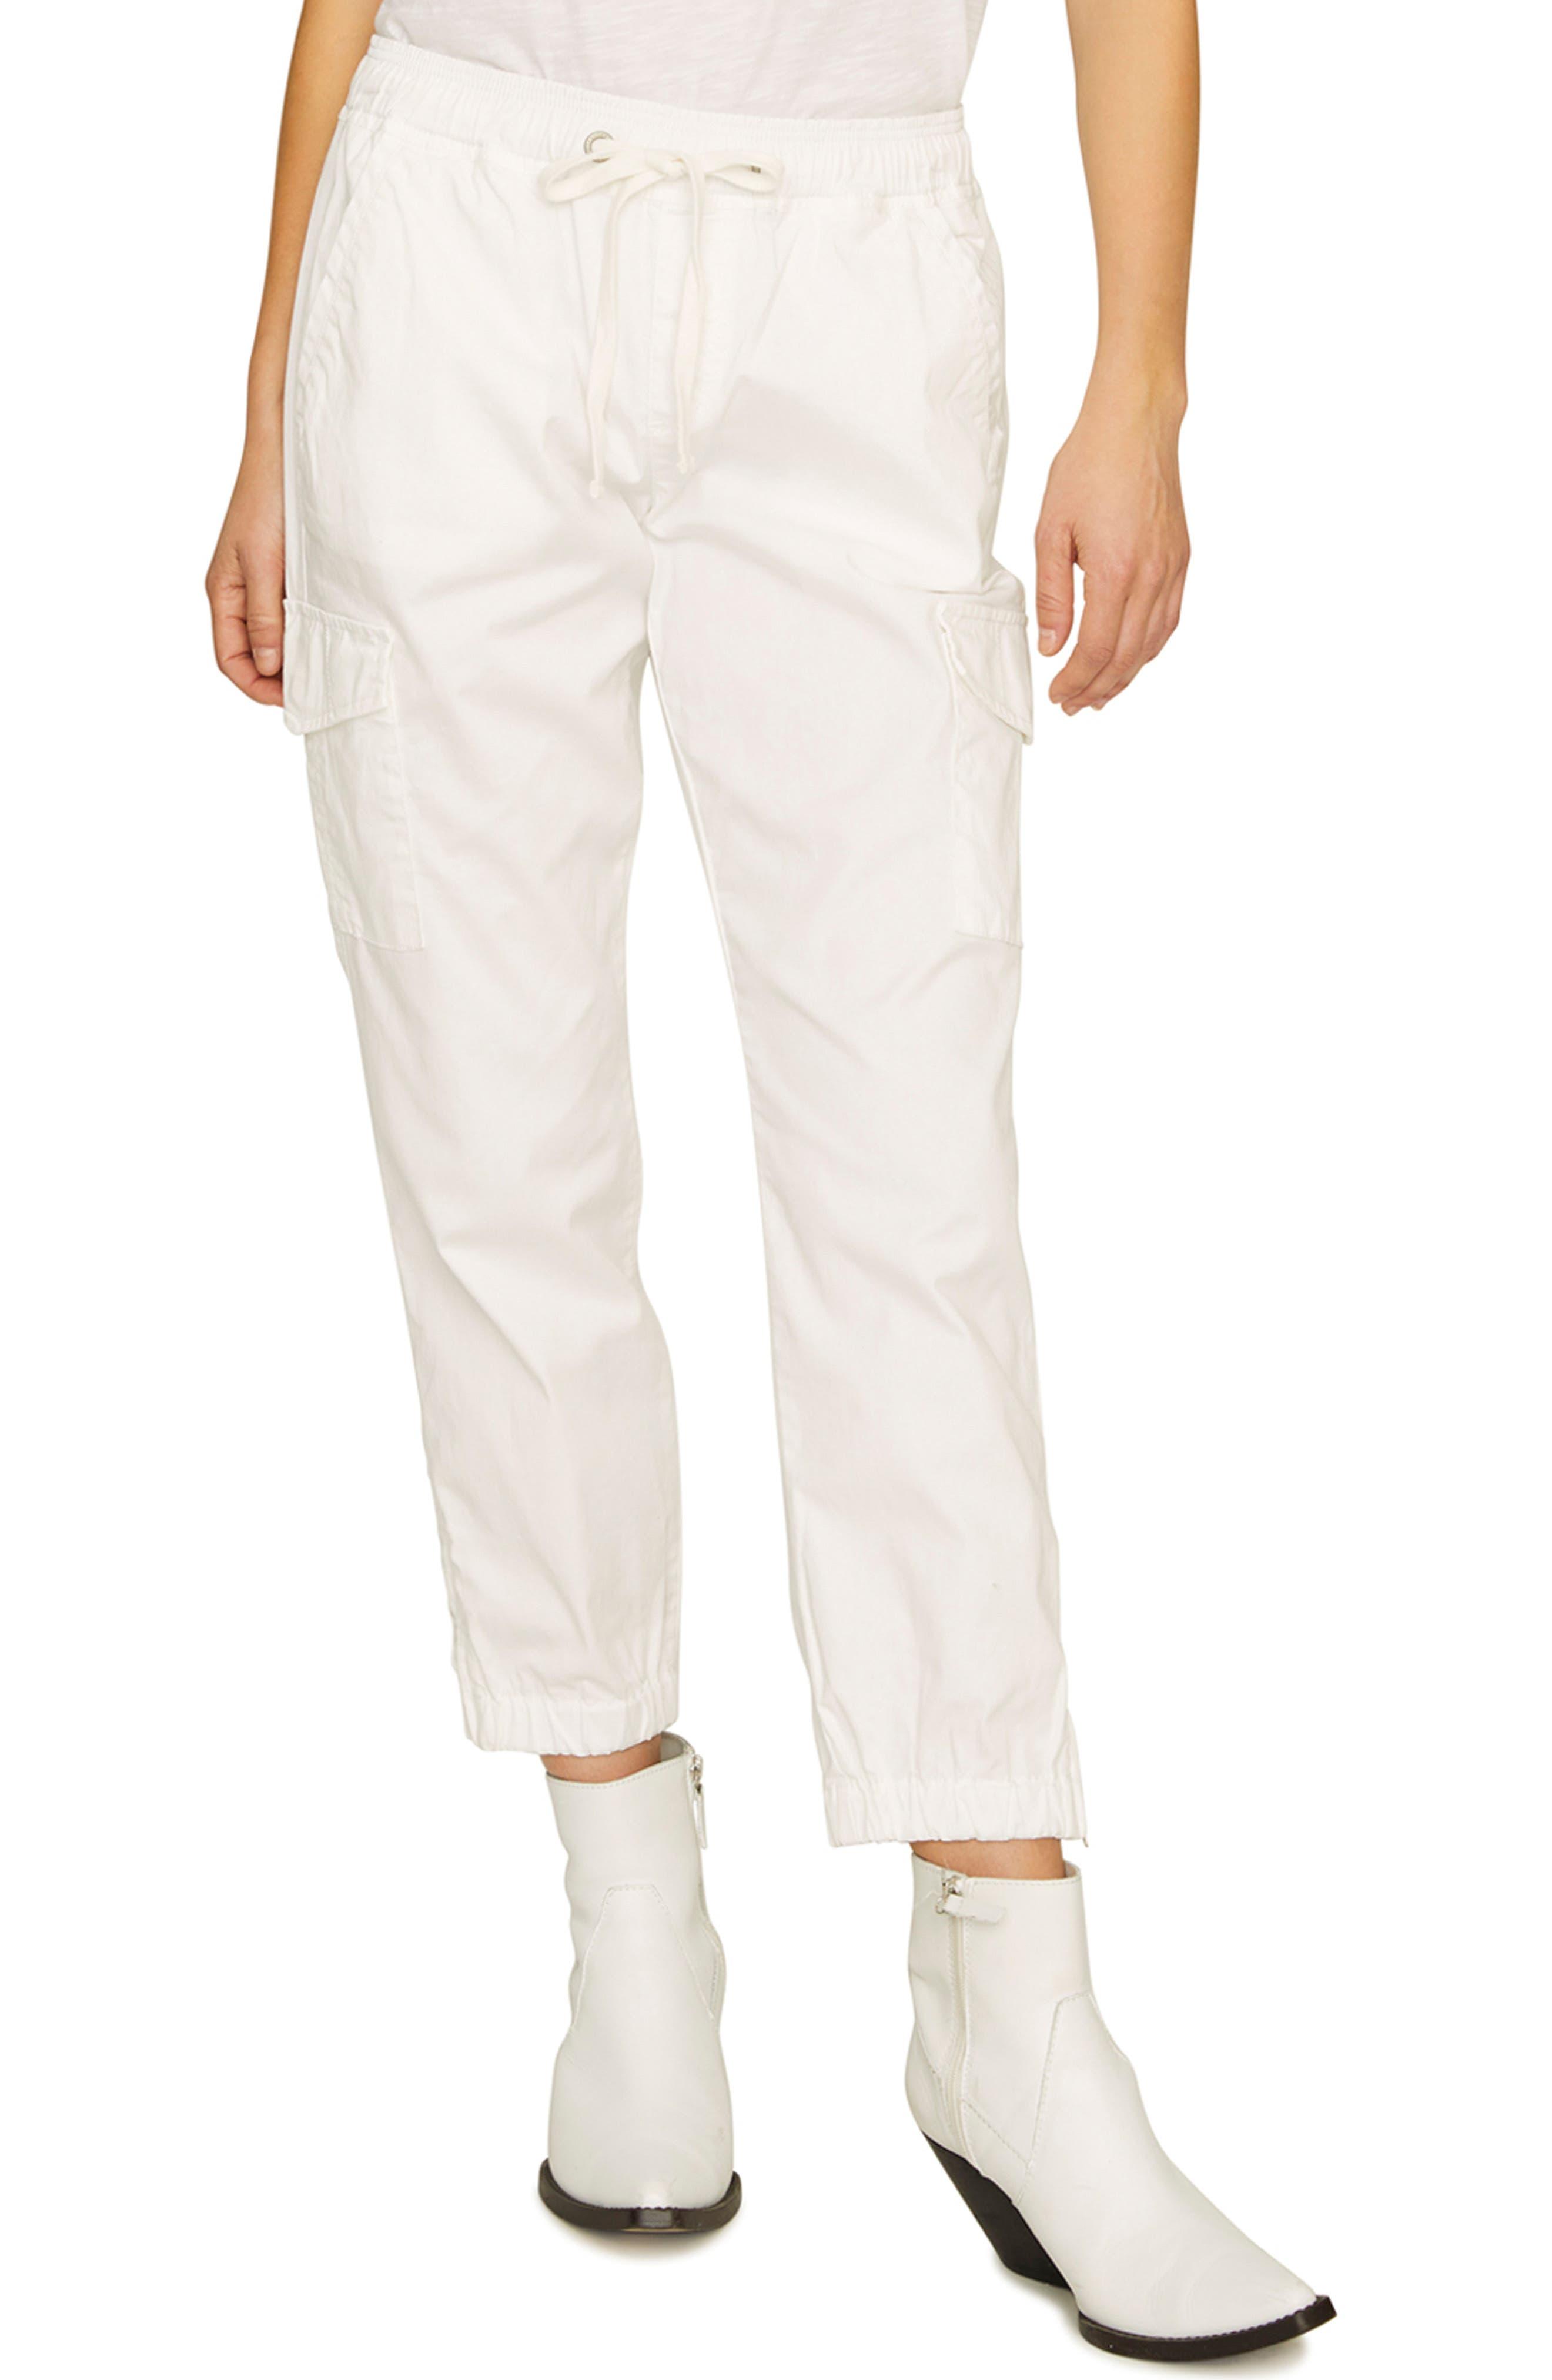 SANCTUARY Drawstring Trooper Pants, Main, color, BRITE WHITE